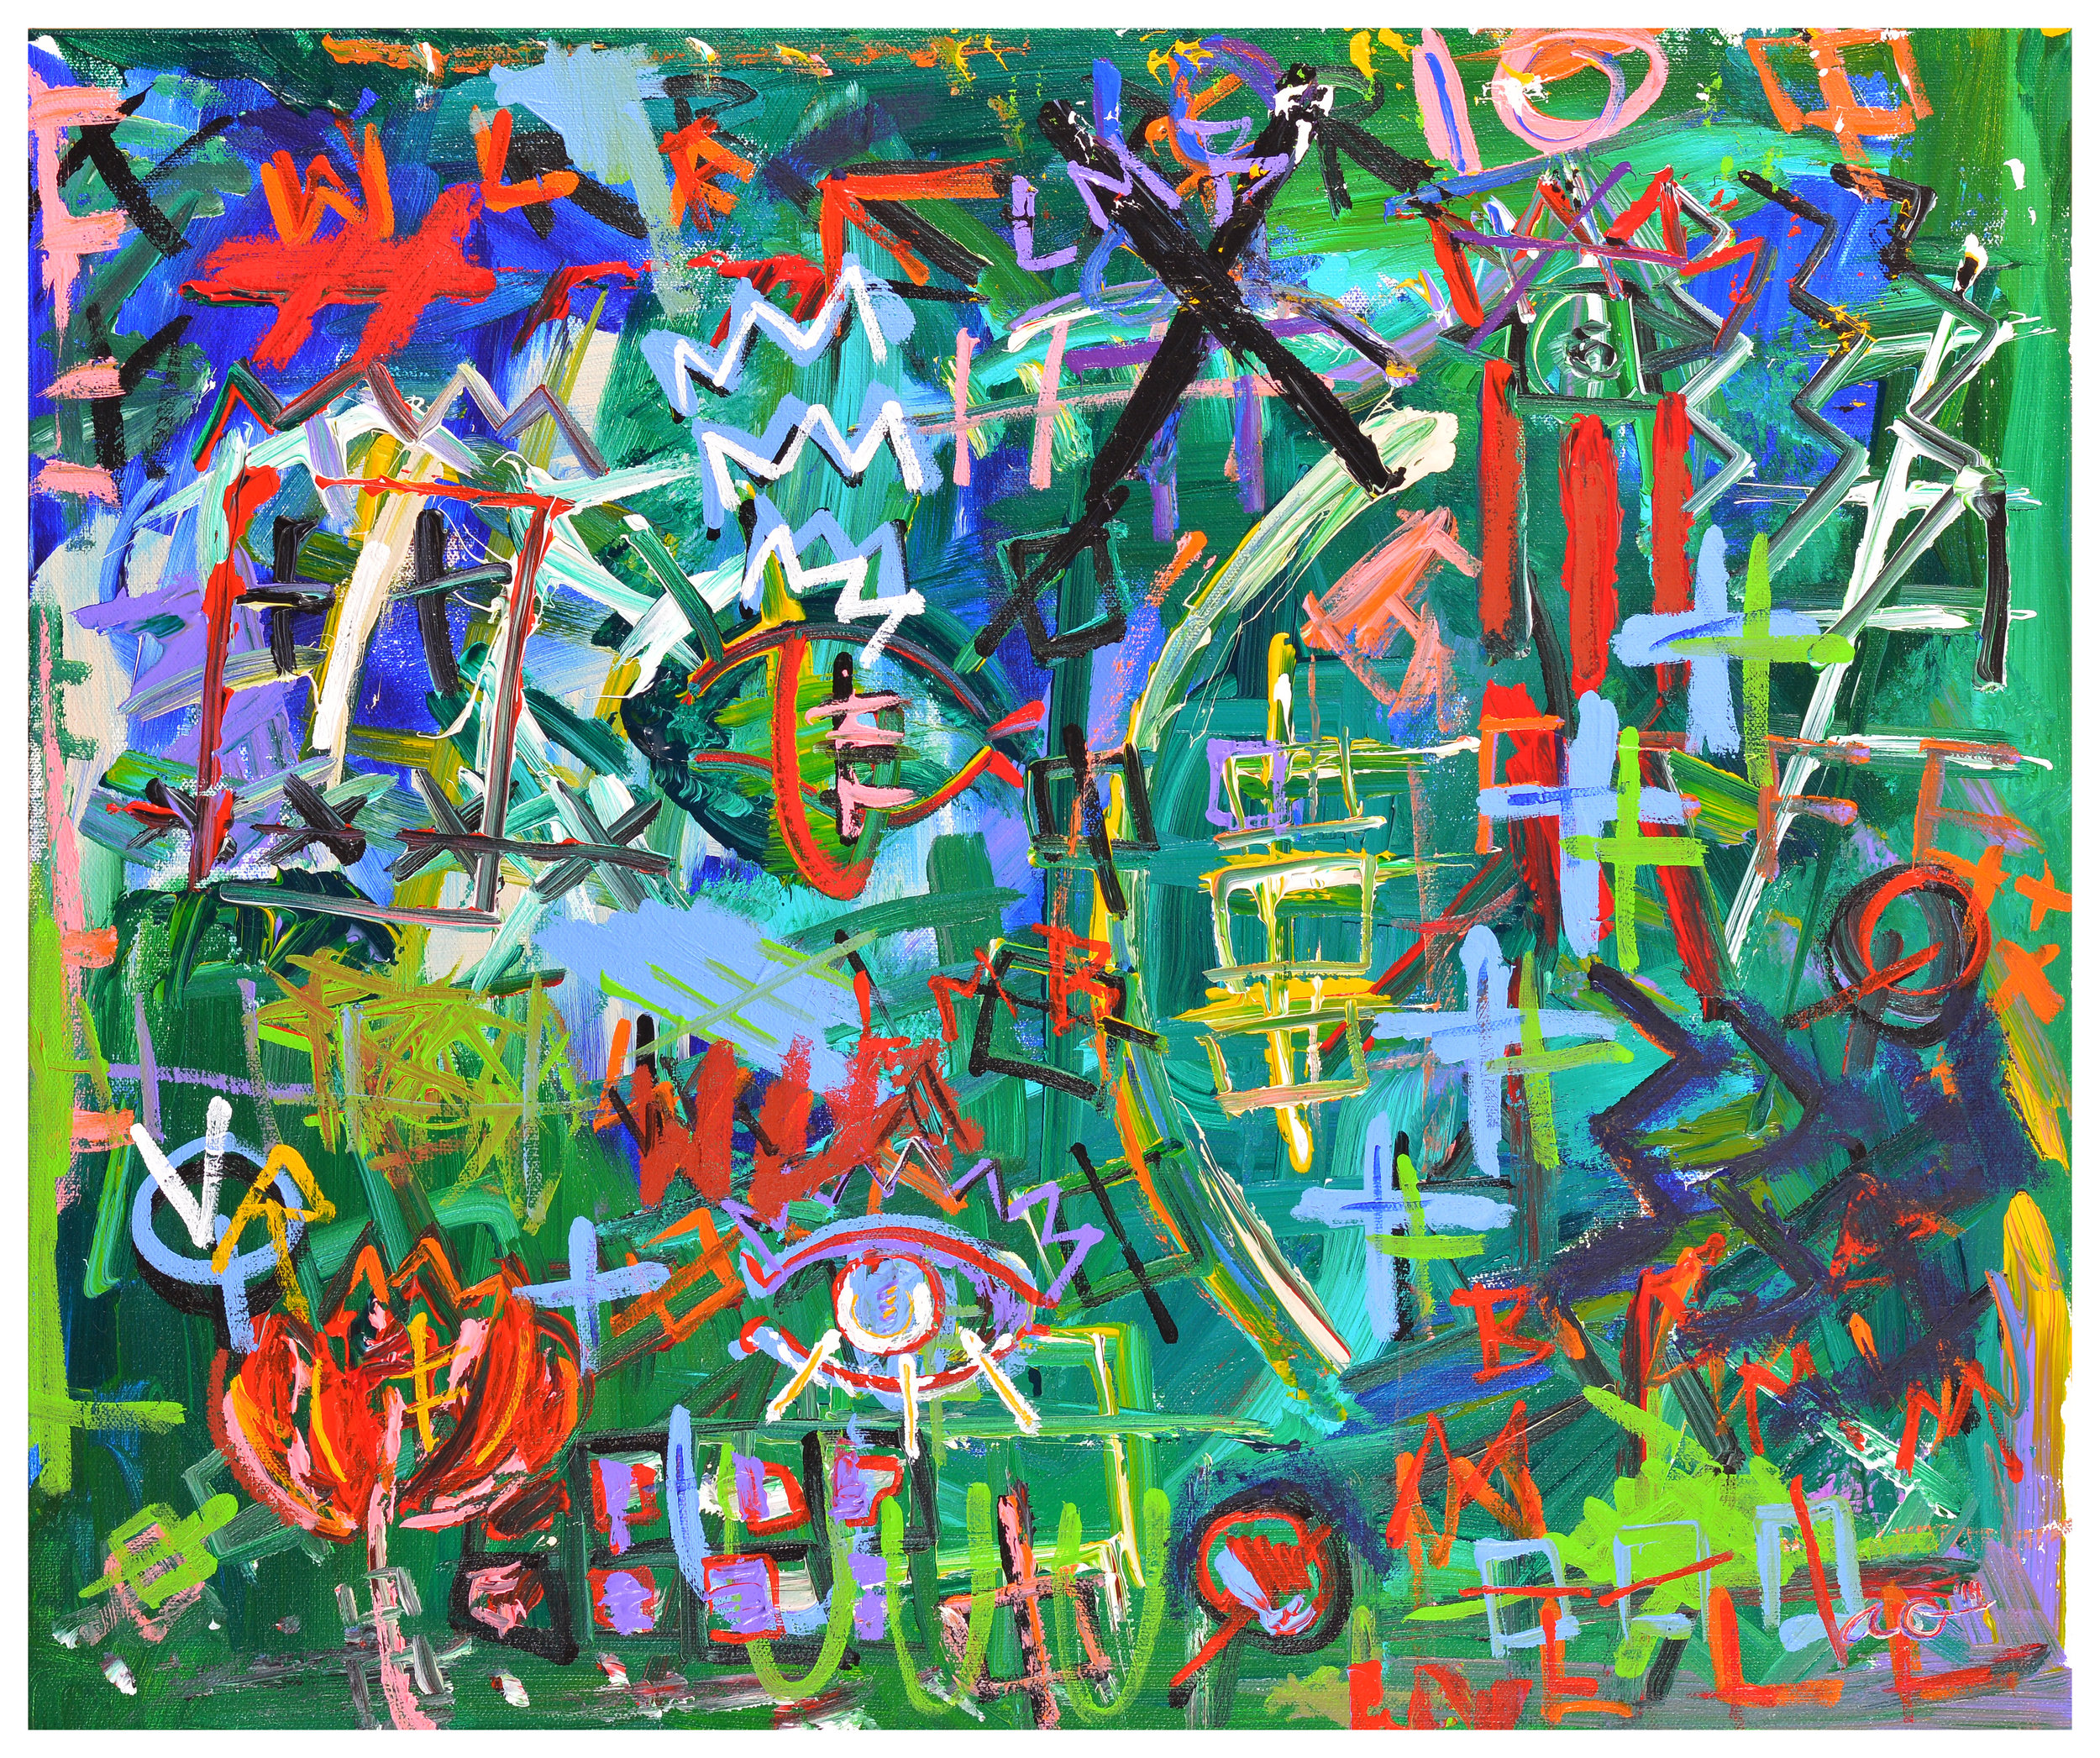 Untitled XX (WLF)